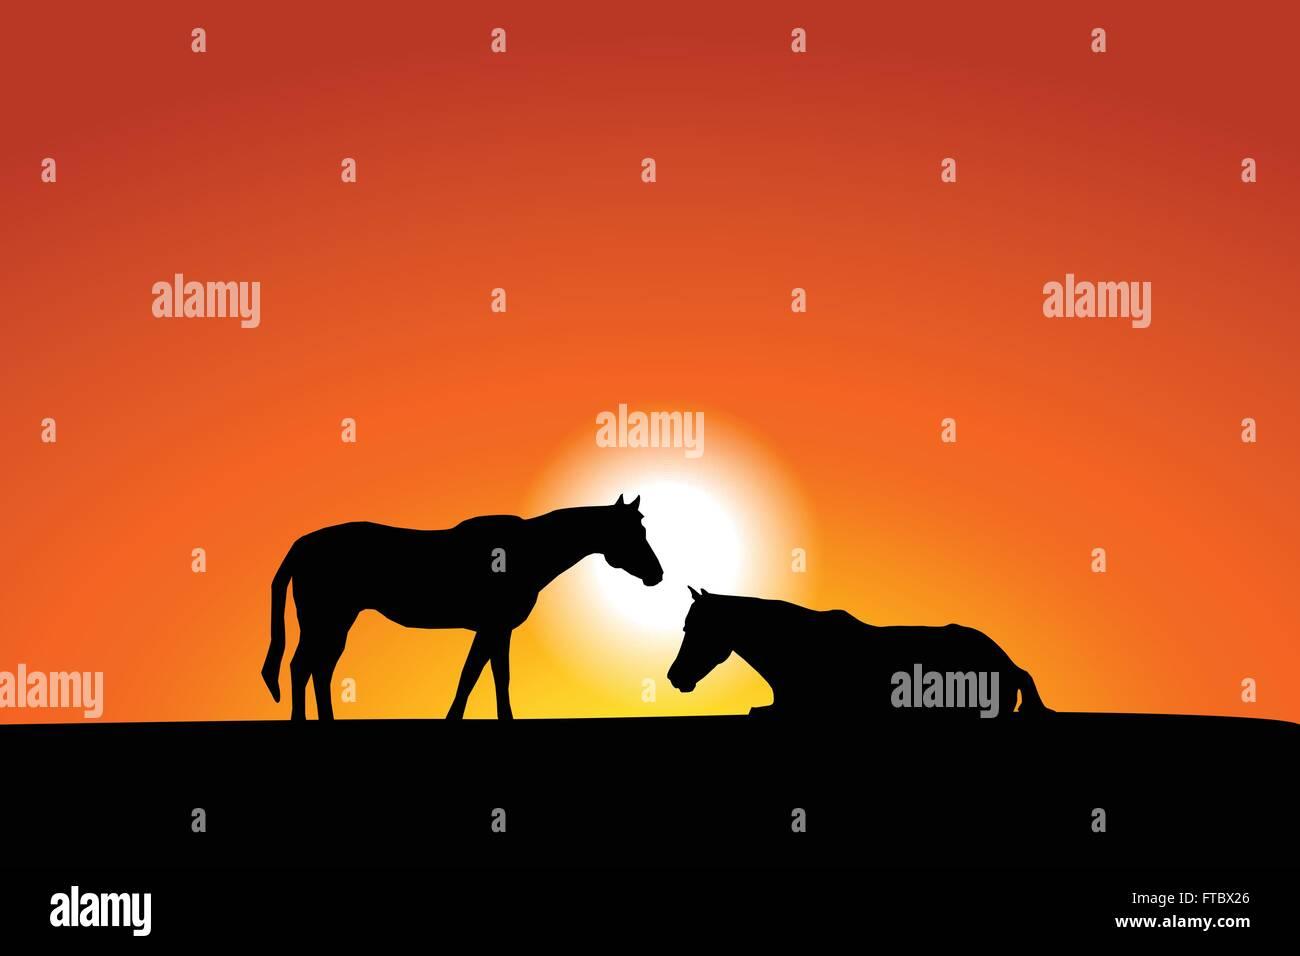 Horses at sunset illustration Stock Vector